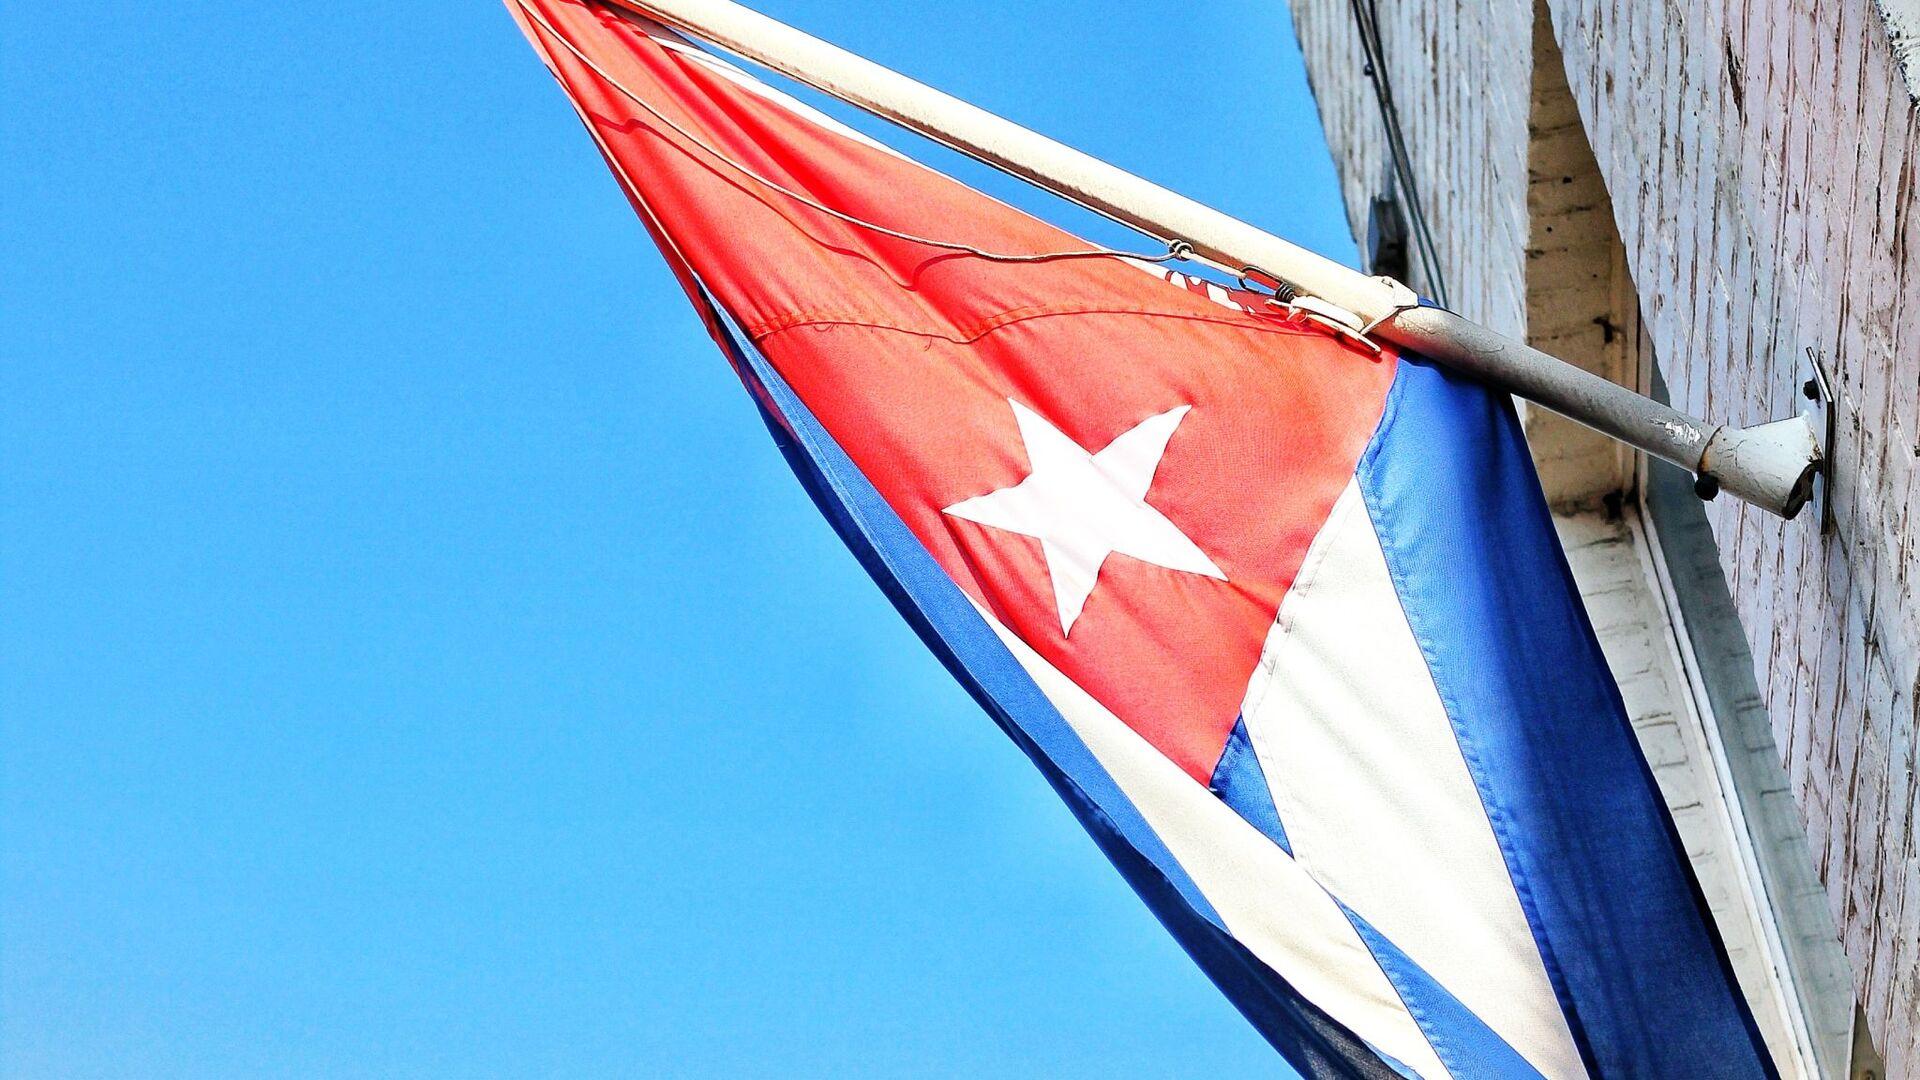 La bandera de Cuba - Sputnik Mundo, 1920, 23.02.2021